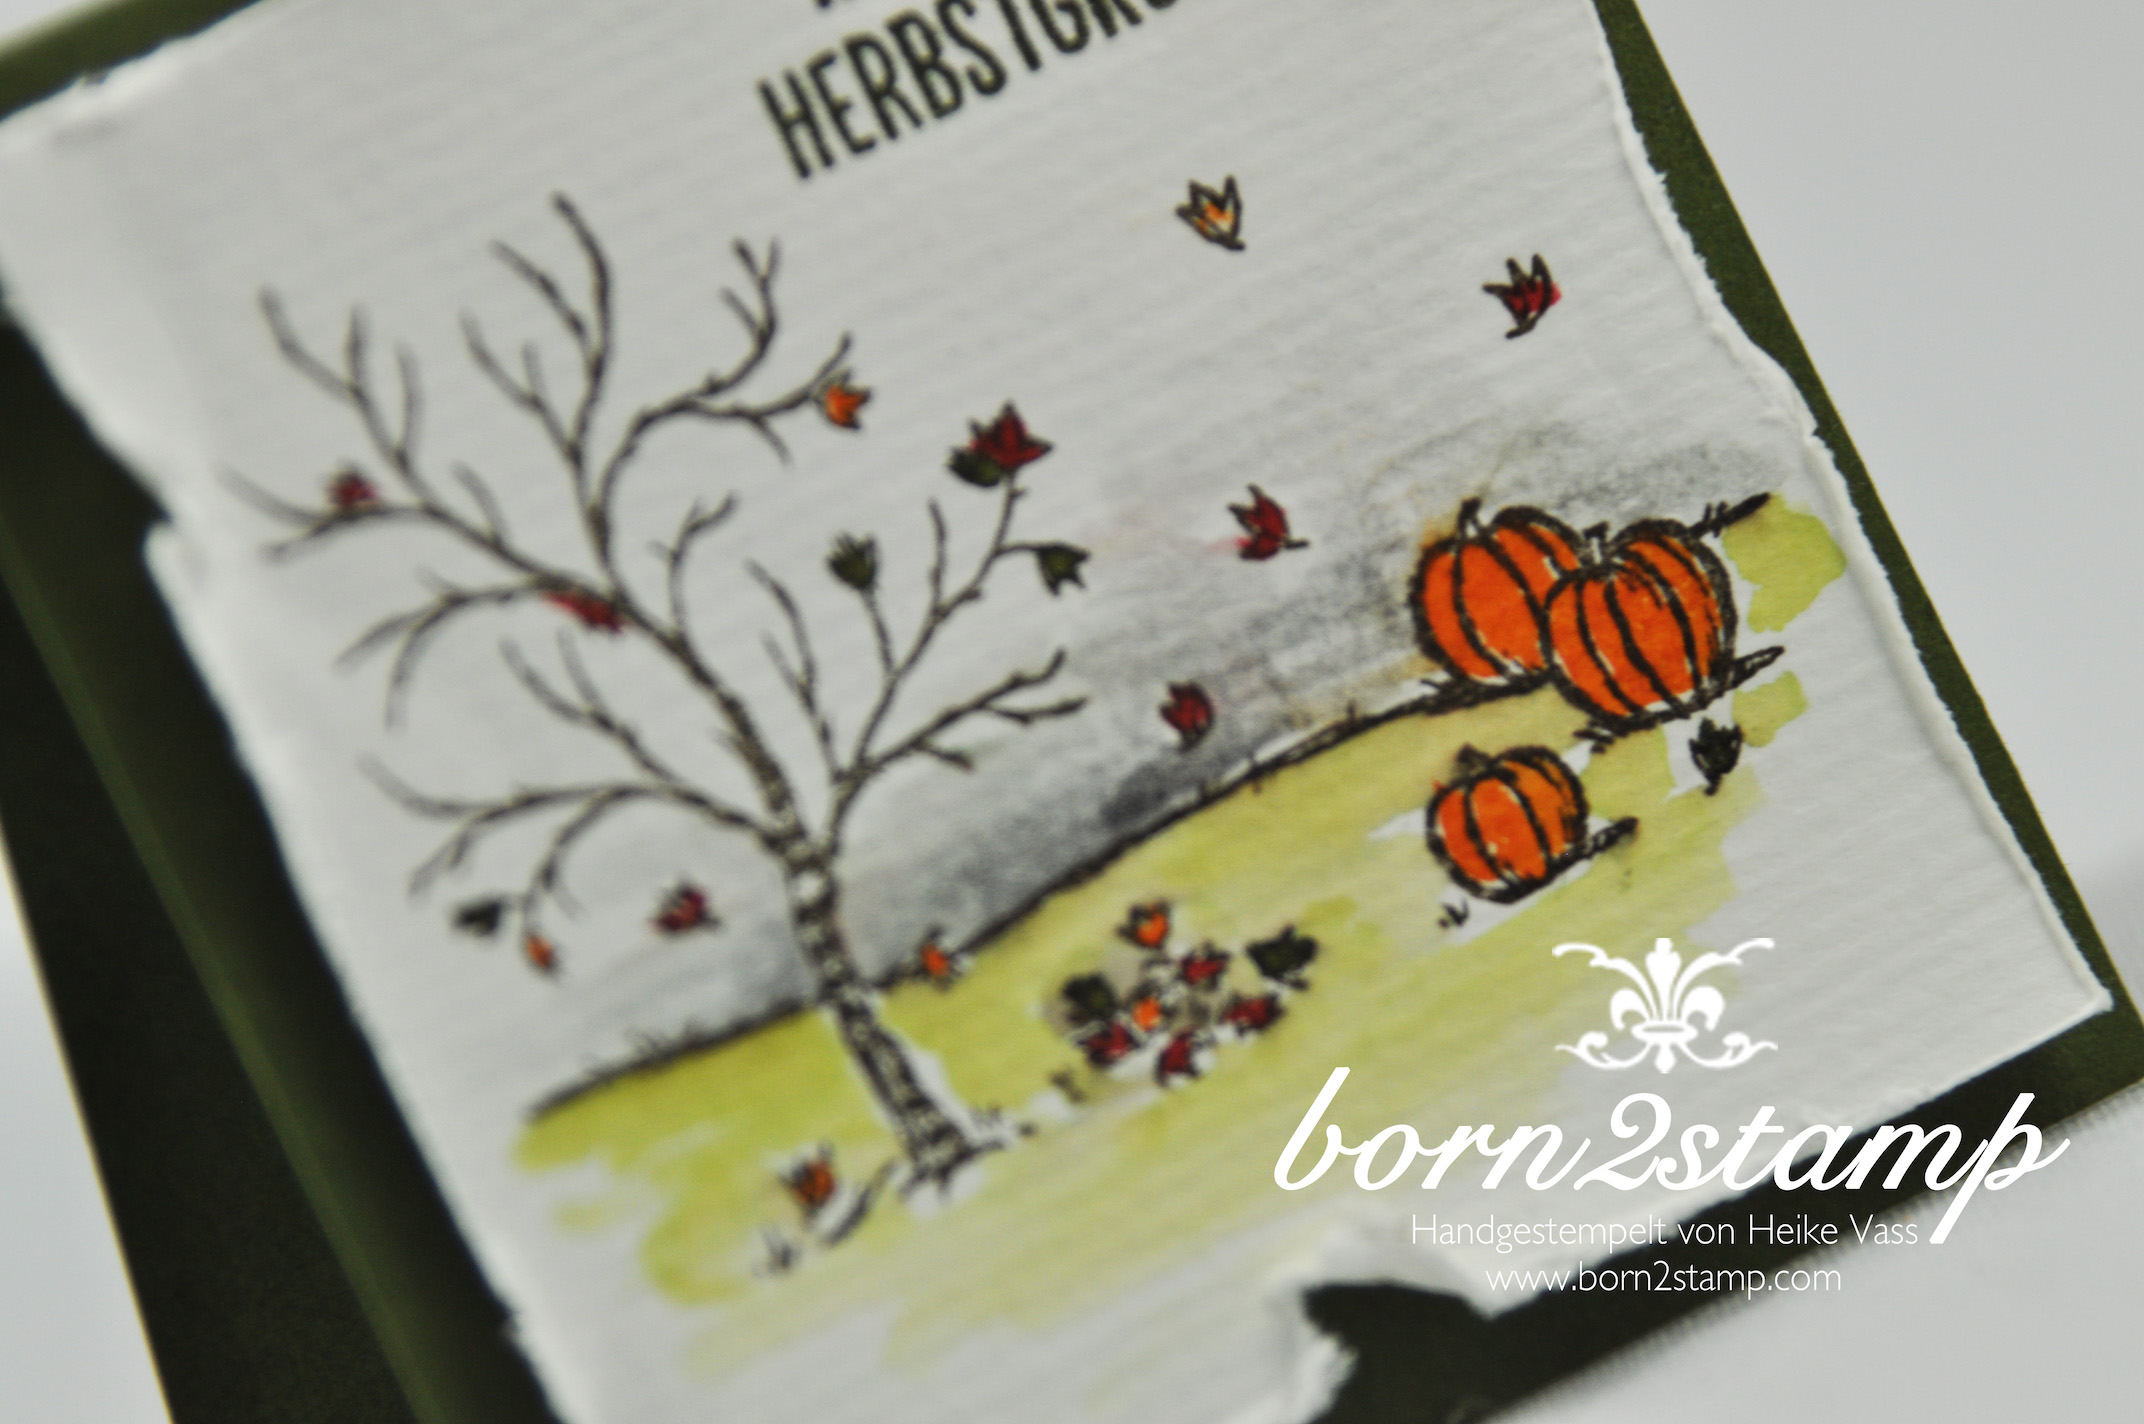 born2stamp STAMPIN' UP! Minikarten – Herbst – Winter – Bloghop – Frohliche Stunden – Aquapainter – Aquarellpapier